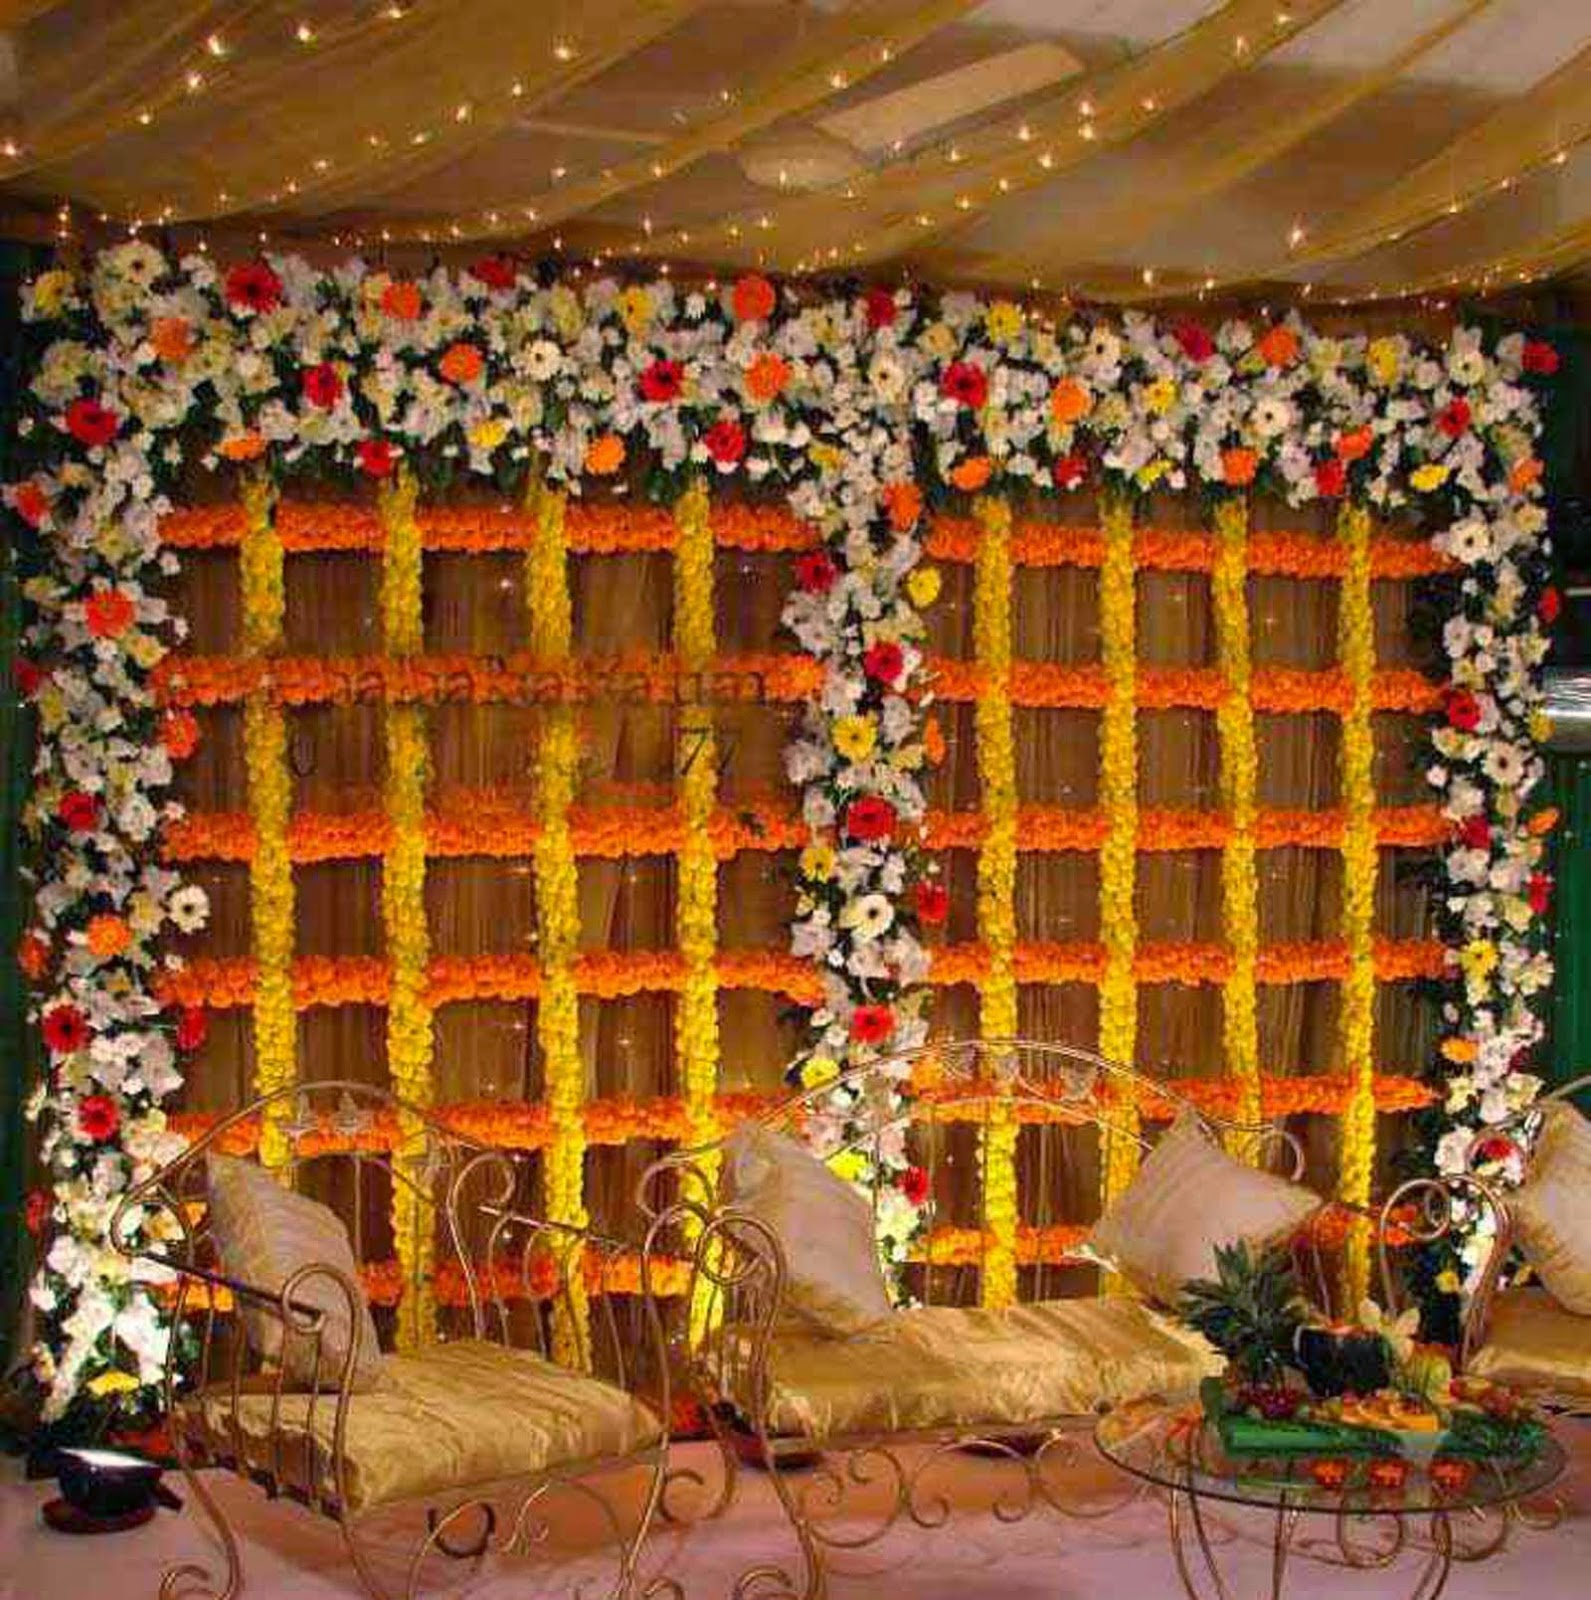 Gaye holud stage design wedding snaps - Photo decoration ideas ...